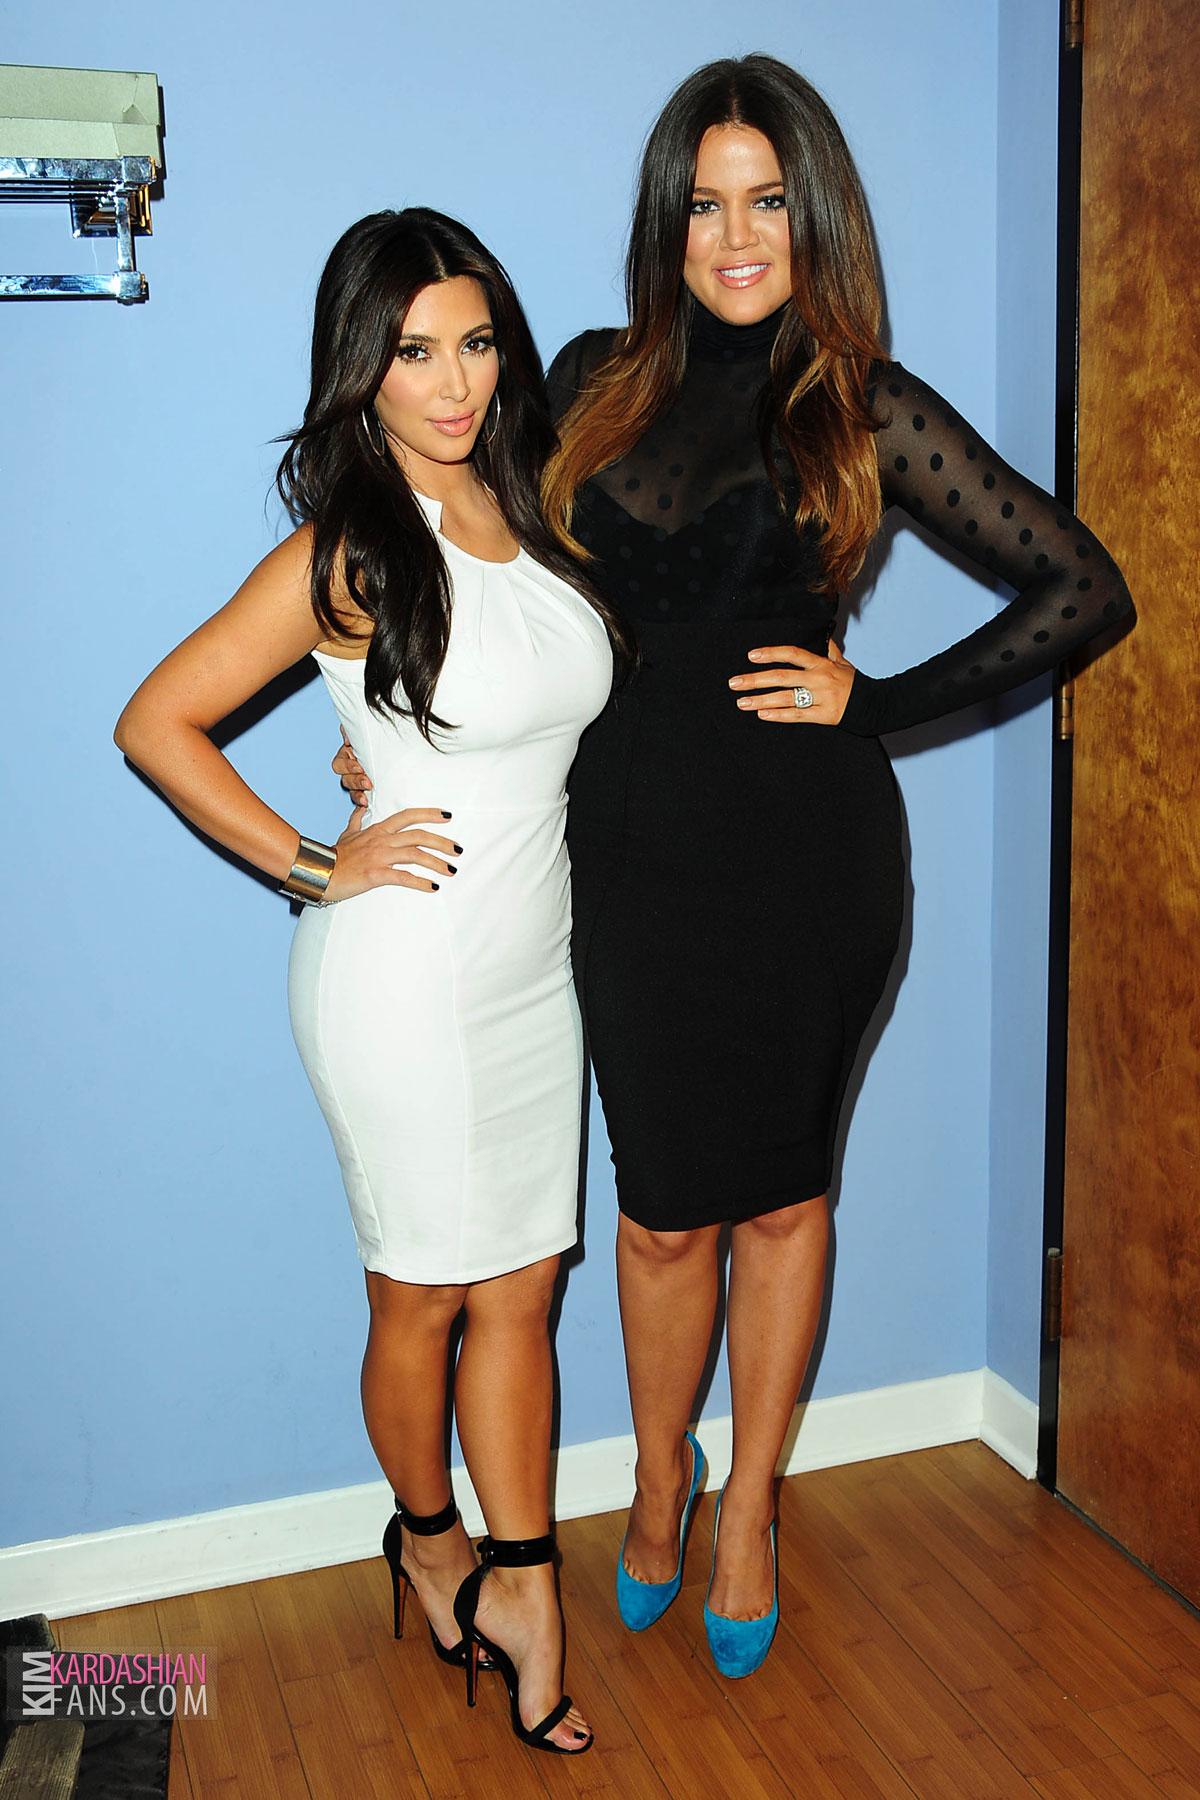 ¿Cuánto mide Khloe Kardashian? - Real height KIM-KHLOE-and-KOURTNEY-KARDASHIAN-at-The-Tonight-Show-With-Jay-Leno-3